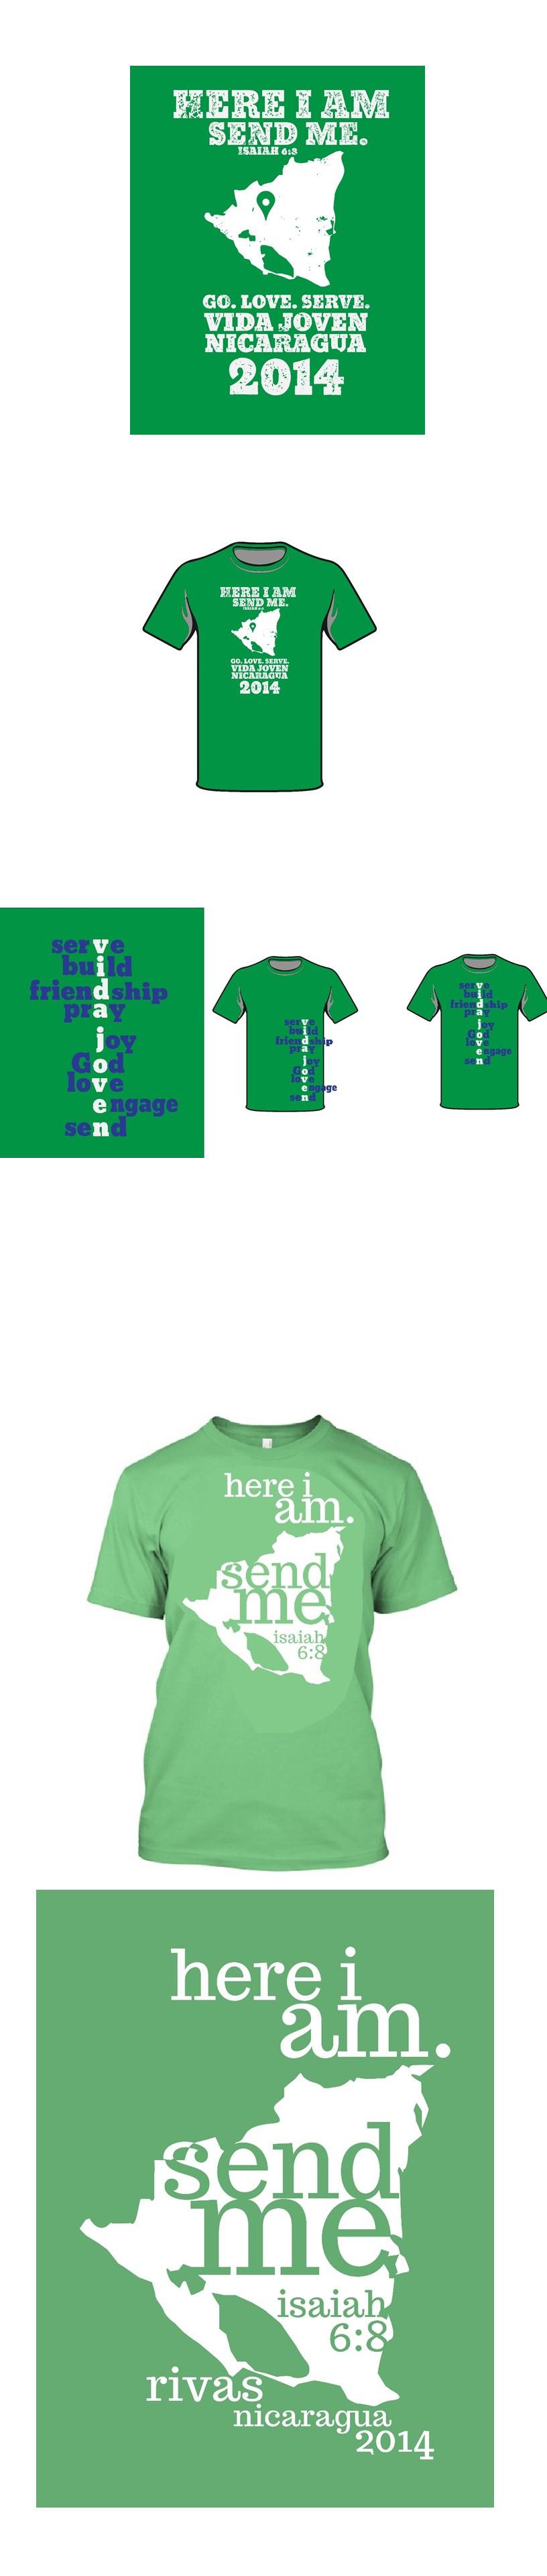 nicragua shirts.jpg